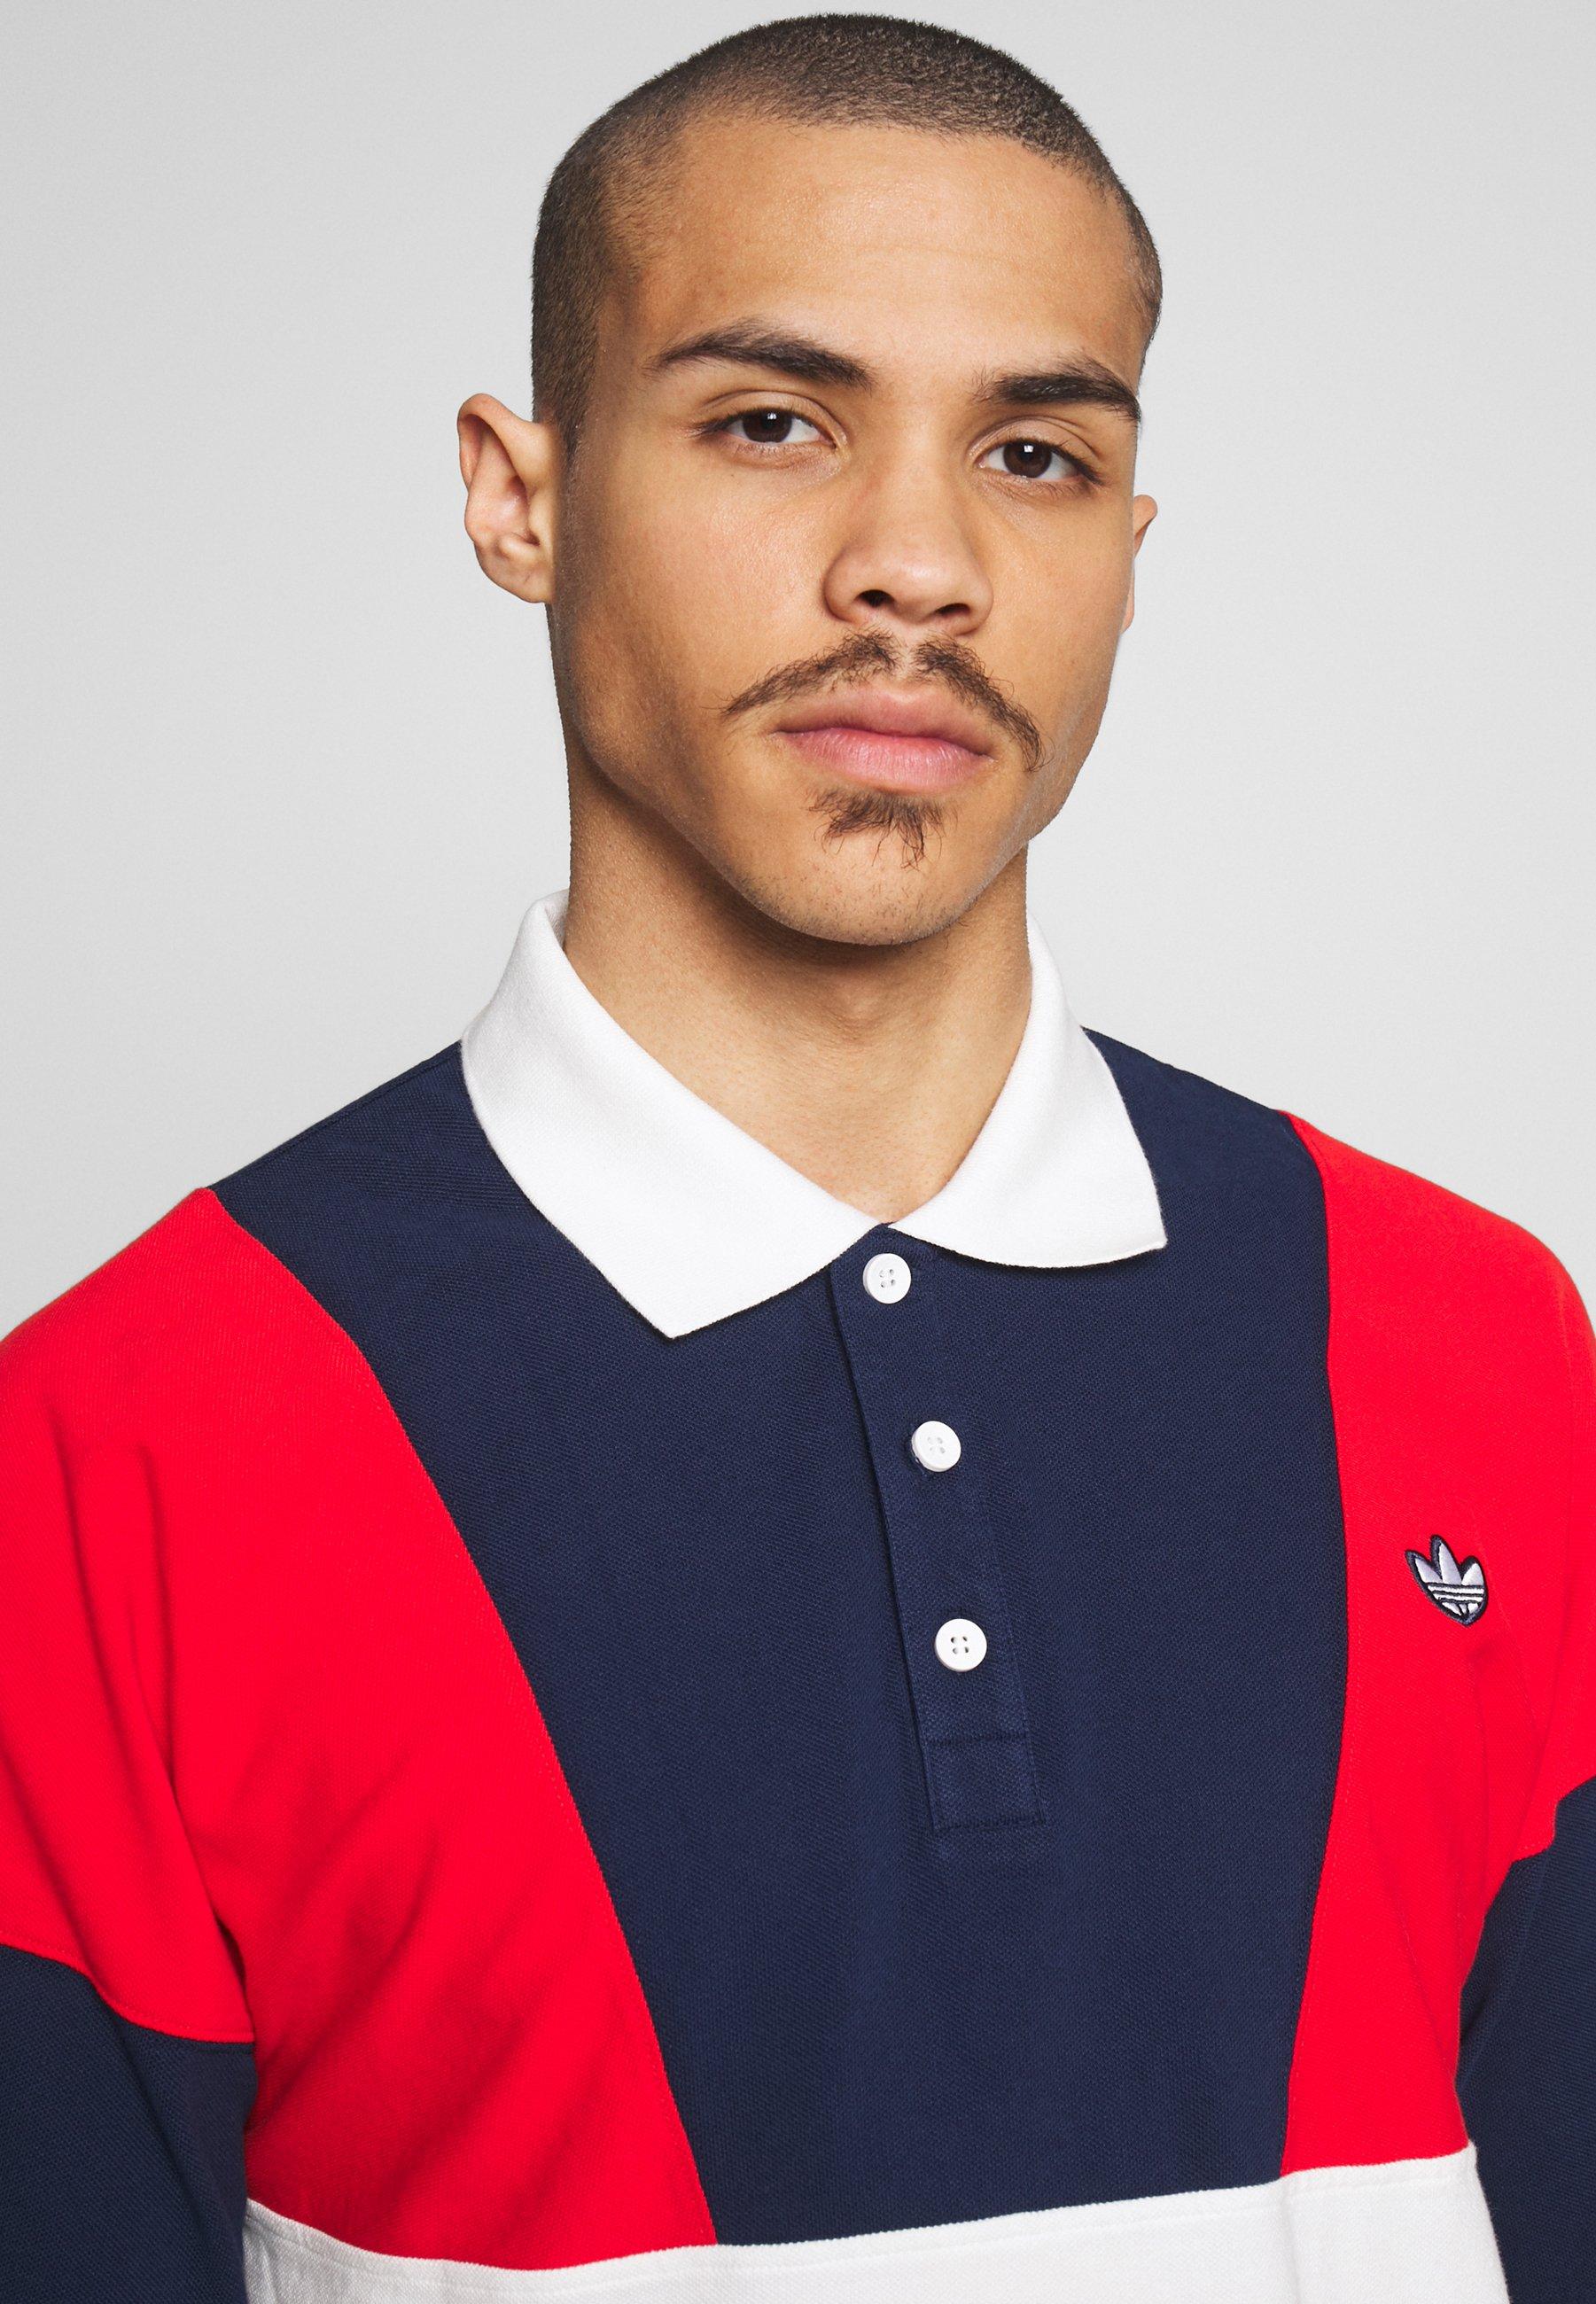 Adidas Originals Koszulka Polo - Red/white/blue